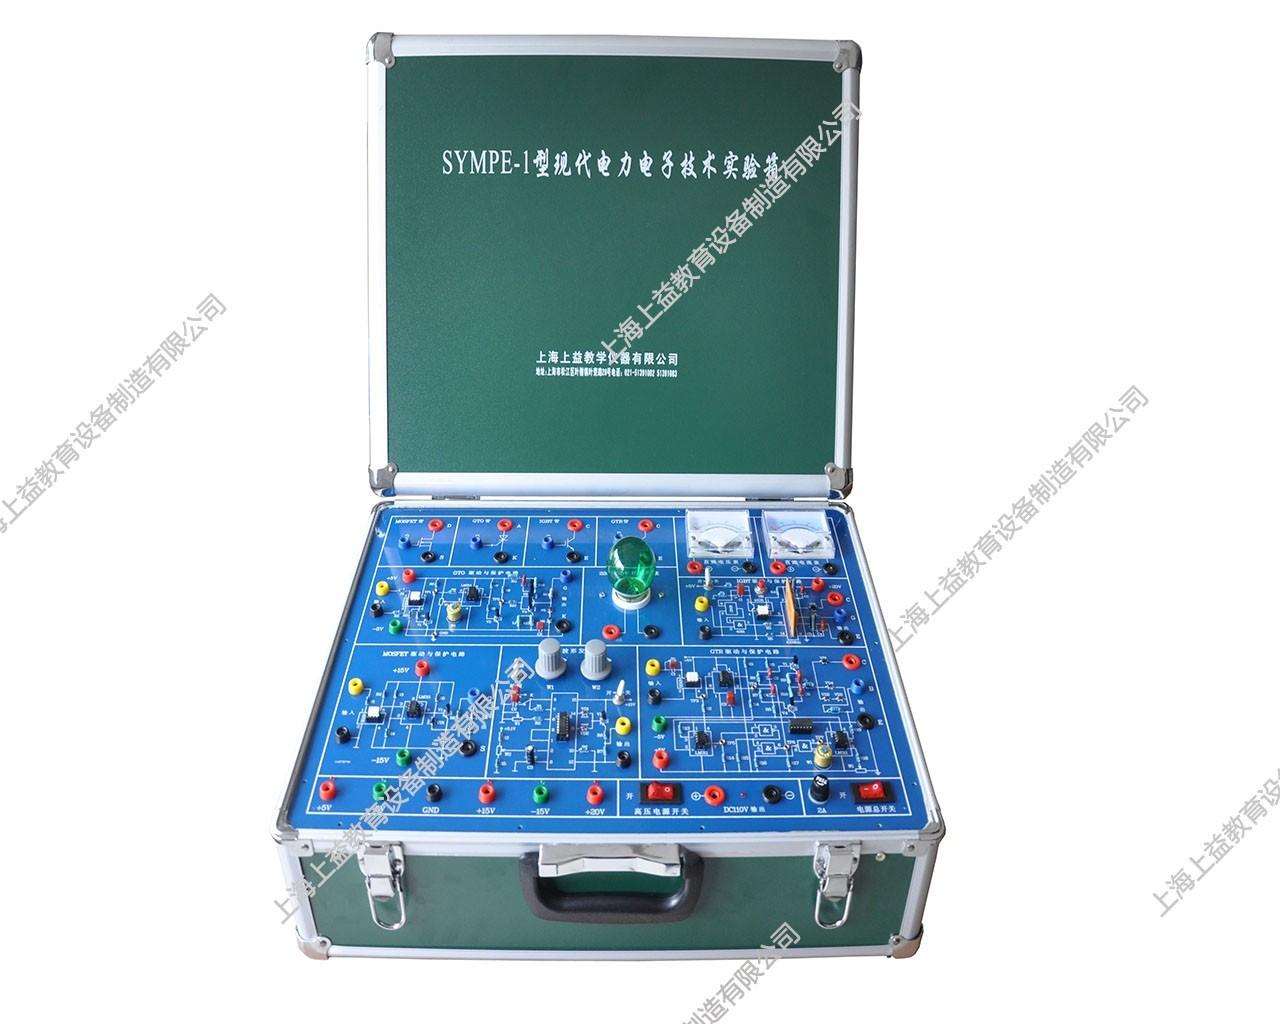 SYMPE-1现代电力电子器件实验箱